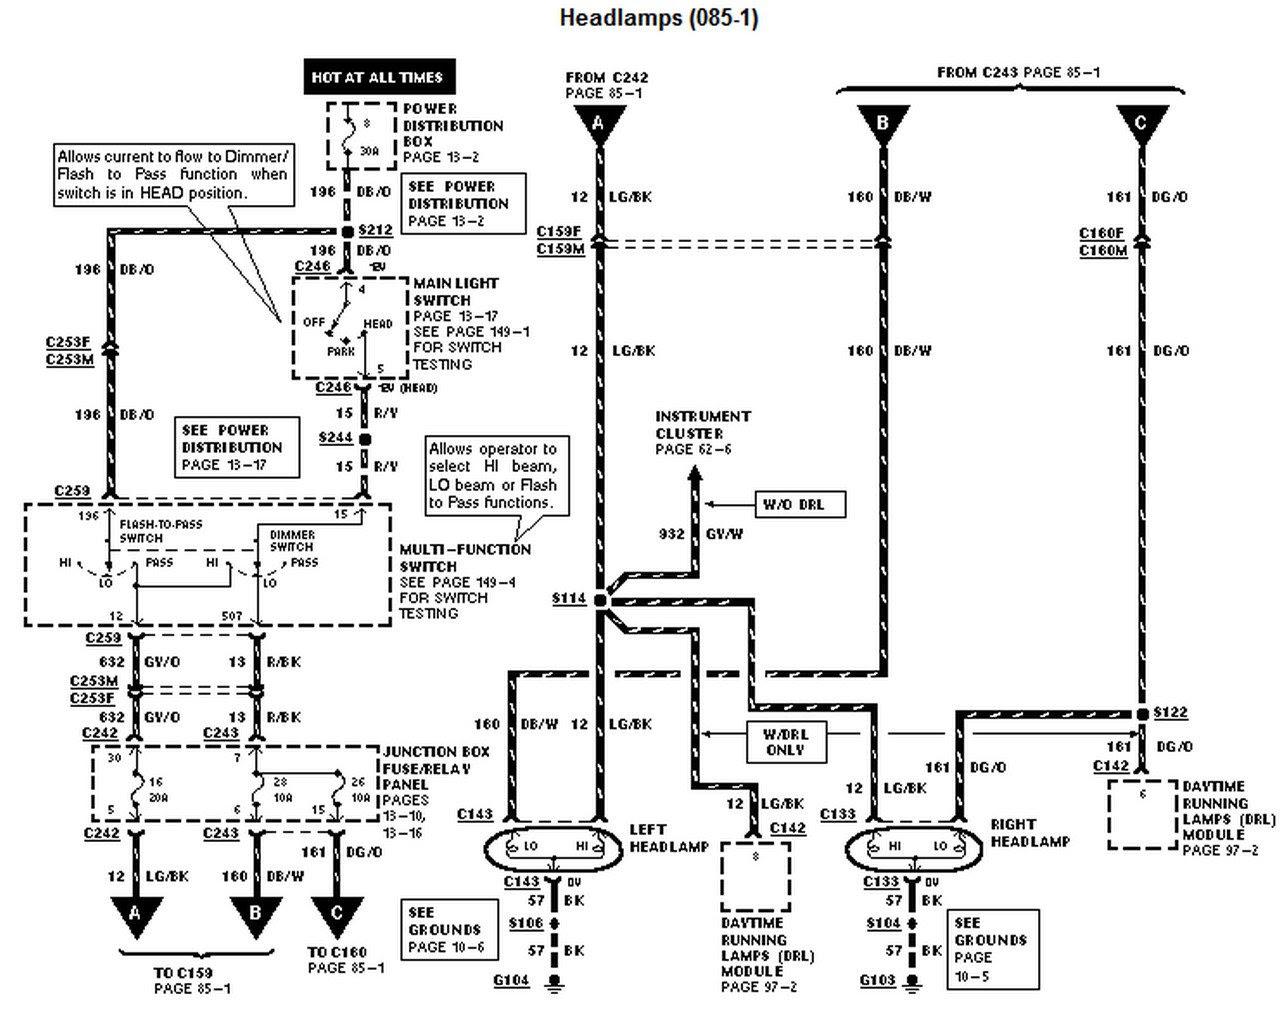 98 Ford f150 spark plug wire diagram